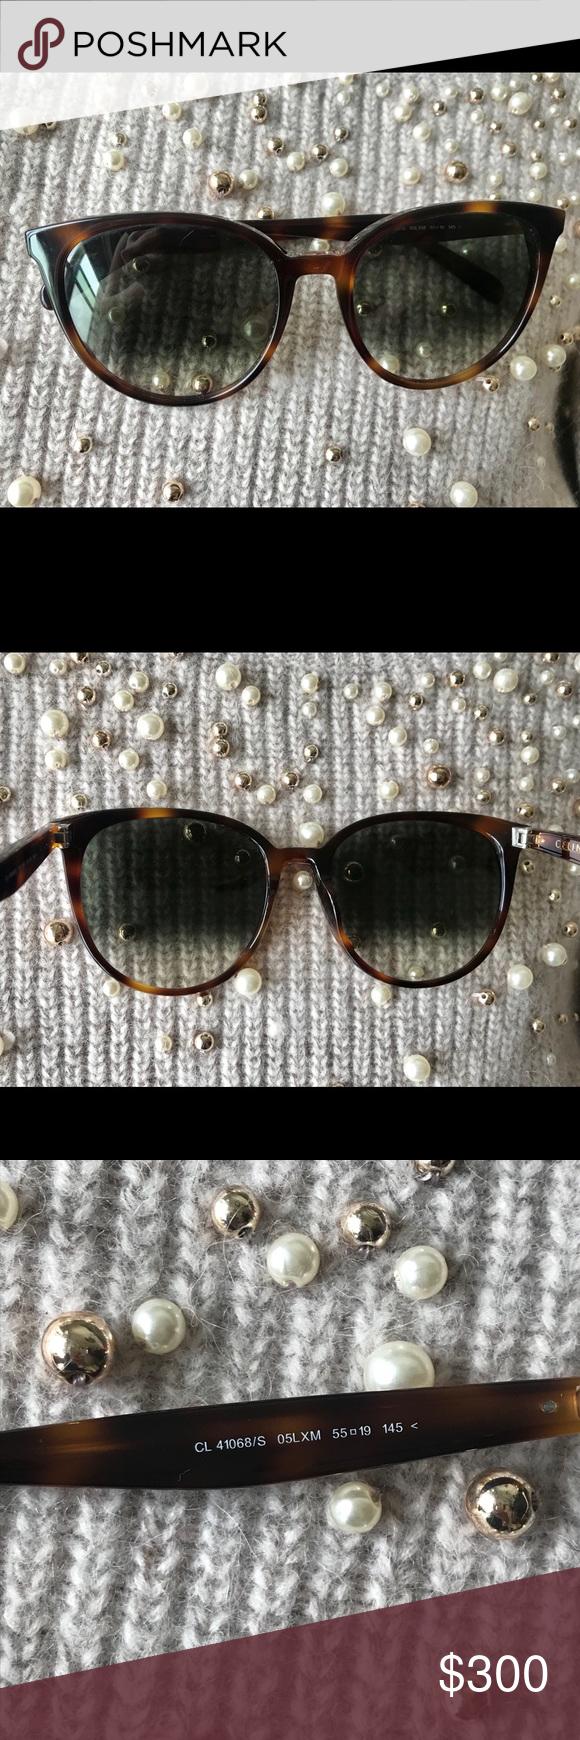 21ecb603d0fb NWOT Céline Thin Mary cat eye sunglasses in 2018